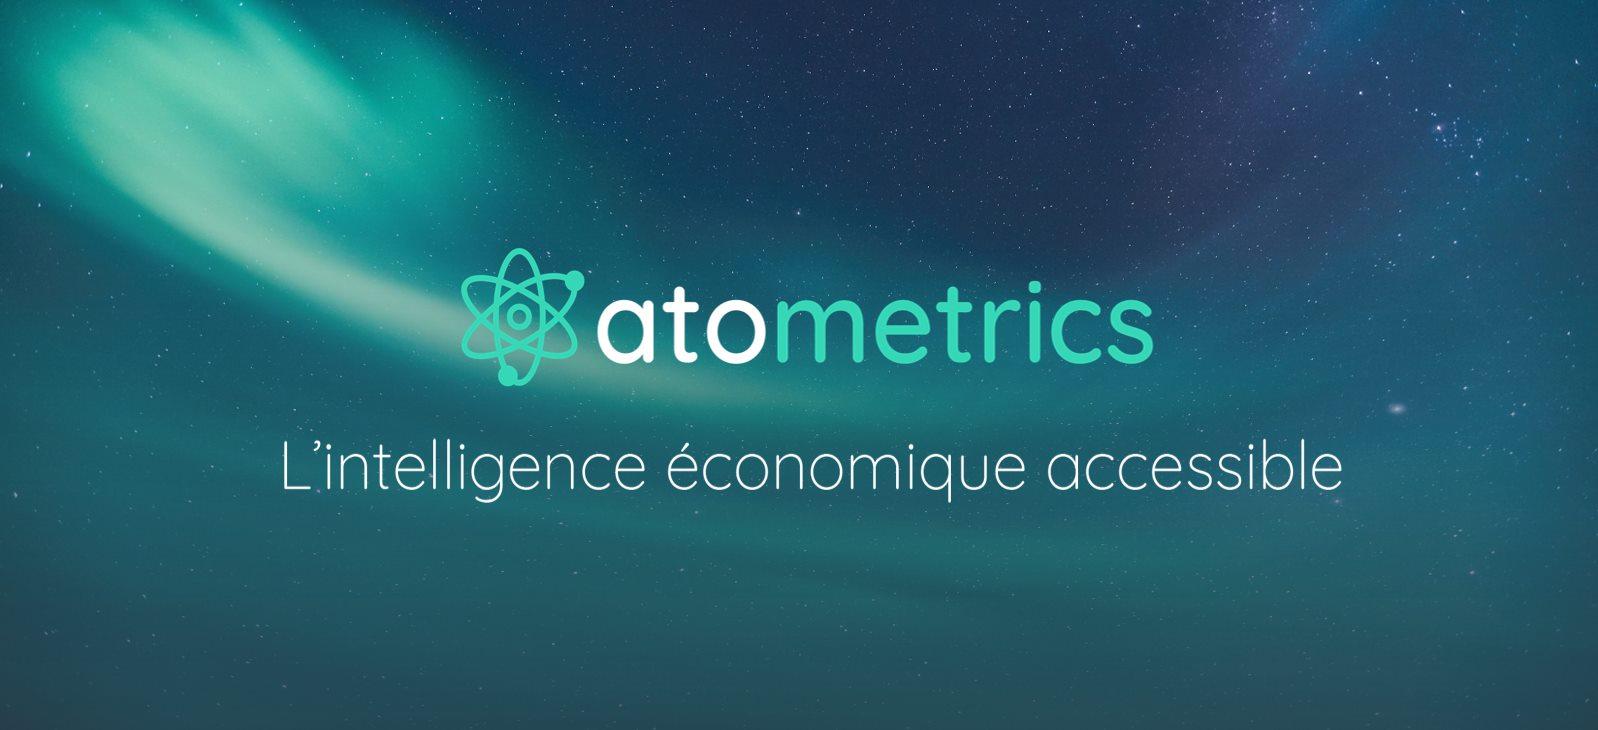 atometrics